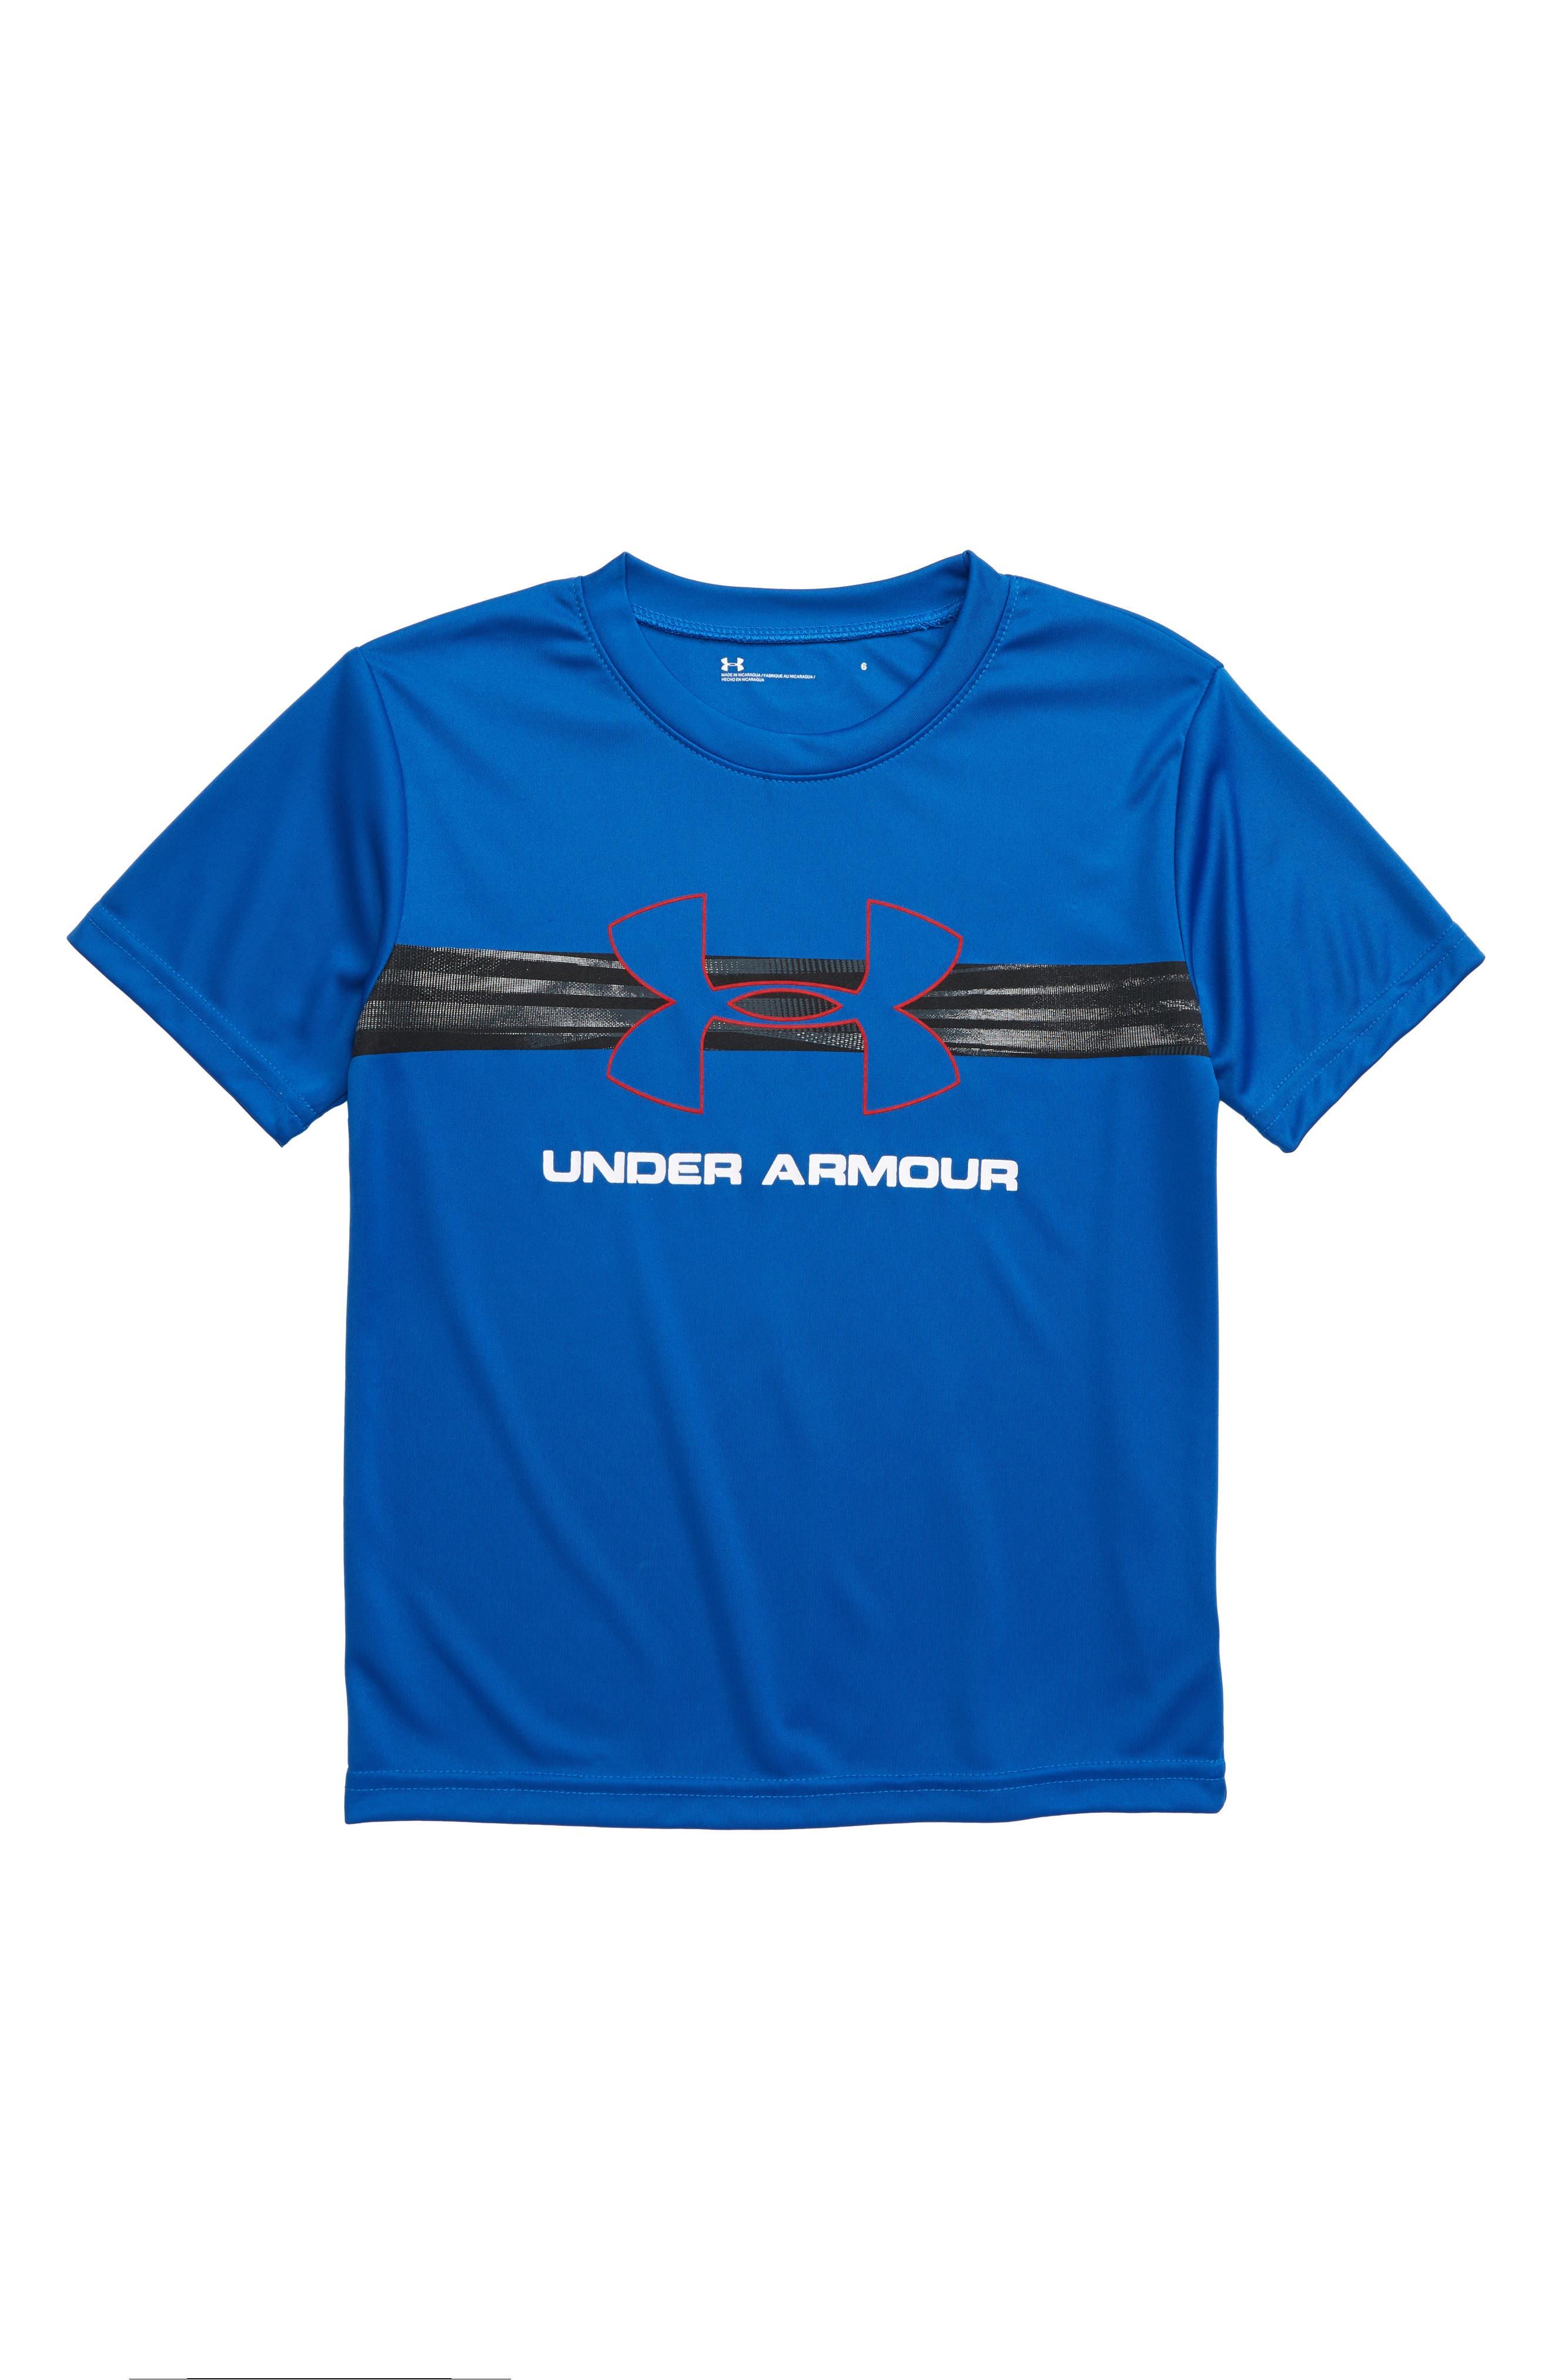 Toddler Boys Under Armour Logo Graphic Heatgear TShirt Size 4T  Blue